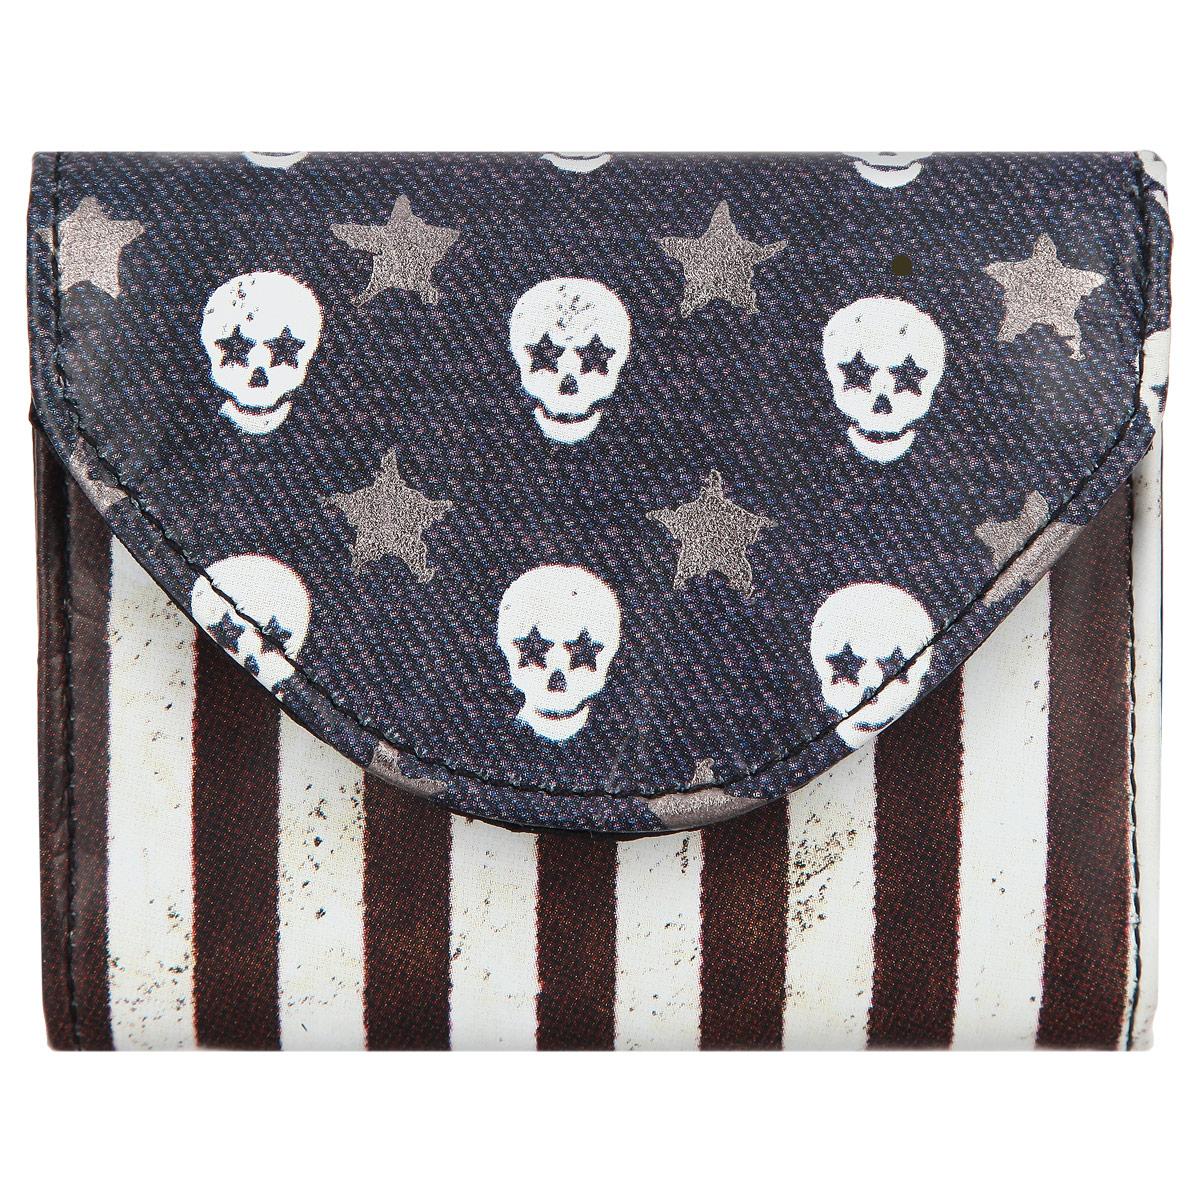 "Визитница-кошелек Mojo pax ""Skull Flag"", цвет: синий, белый, серебряный. KU9982983"